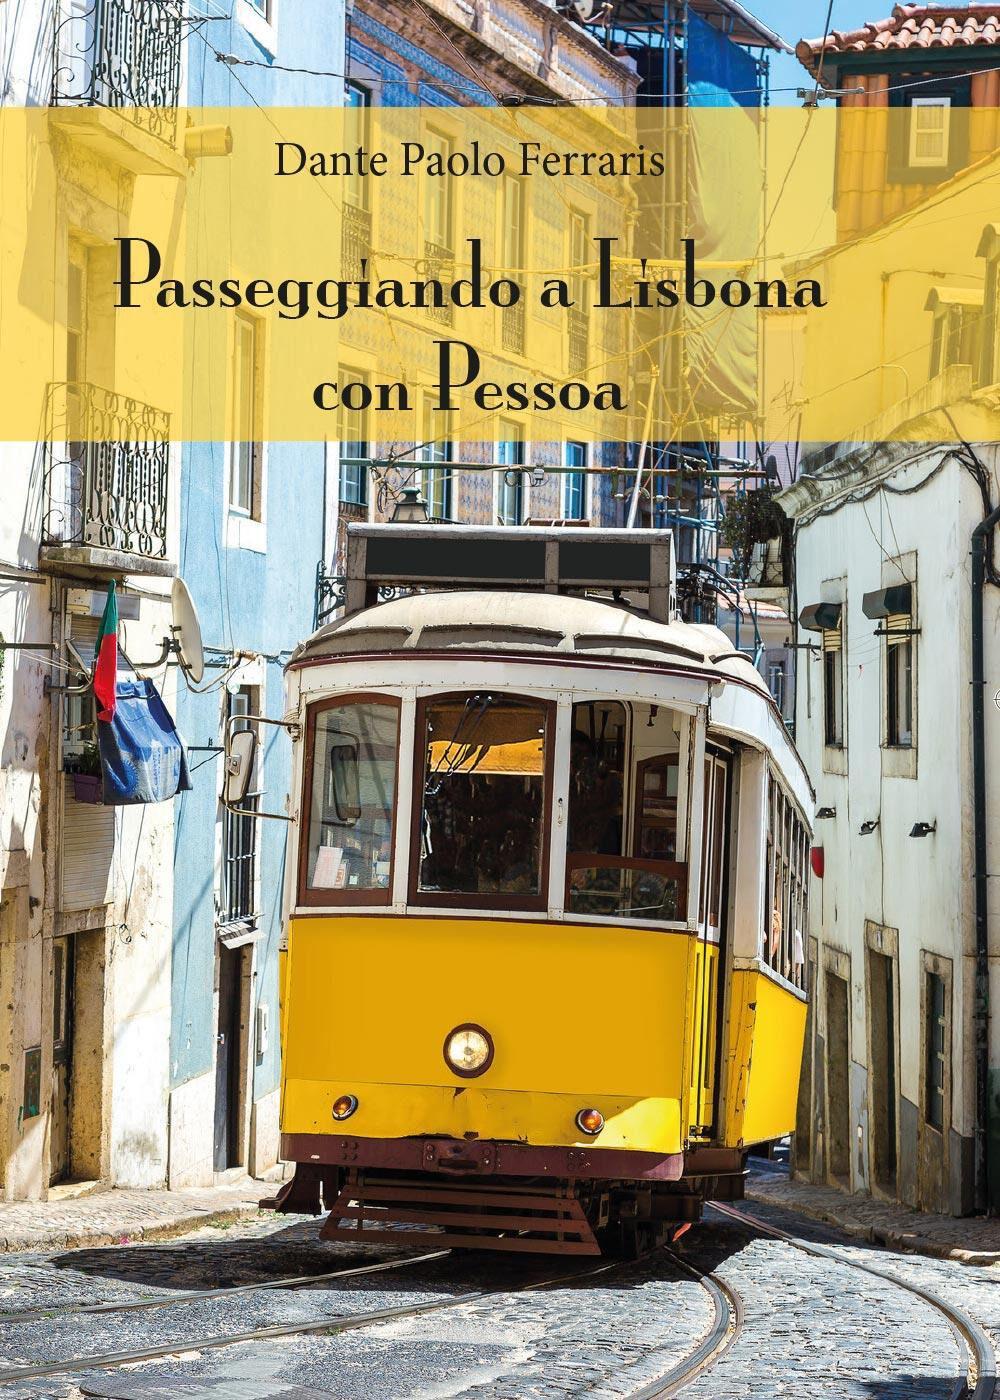 Passeggiando a Lisbona con Pessoa